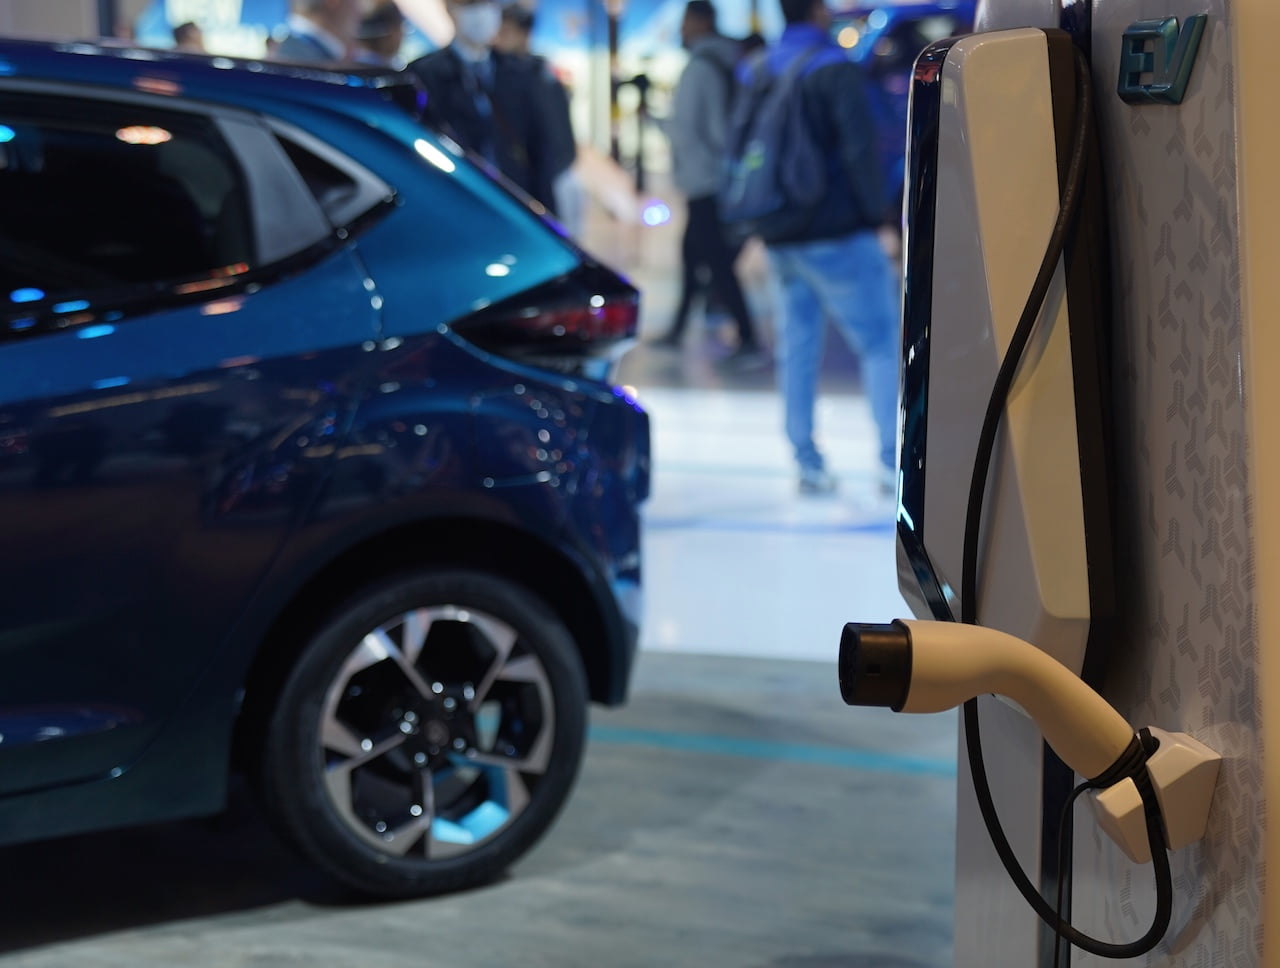 Tata Altroz Tata vehicle charger